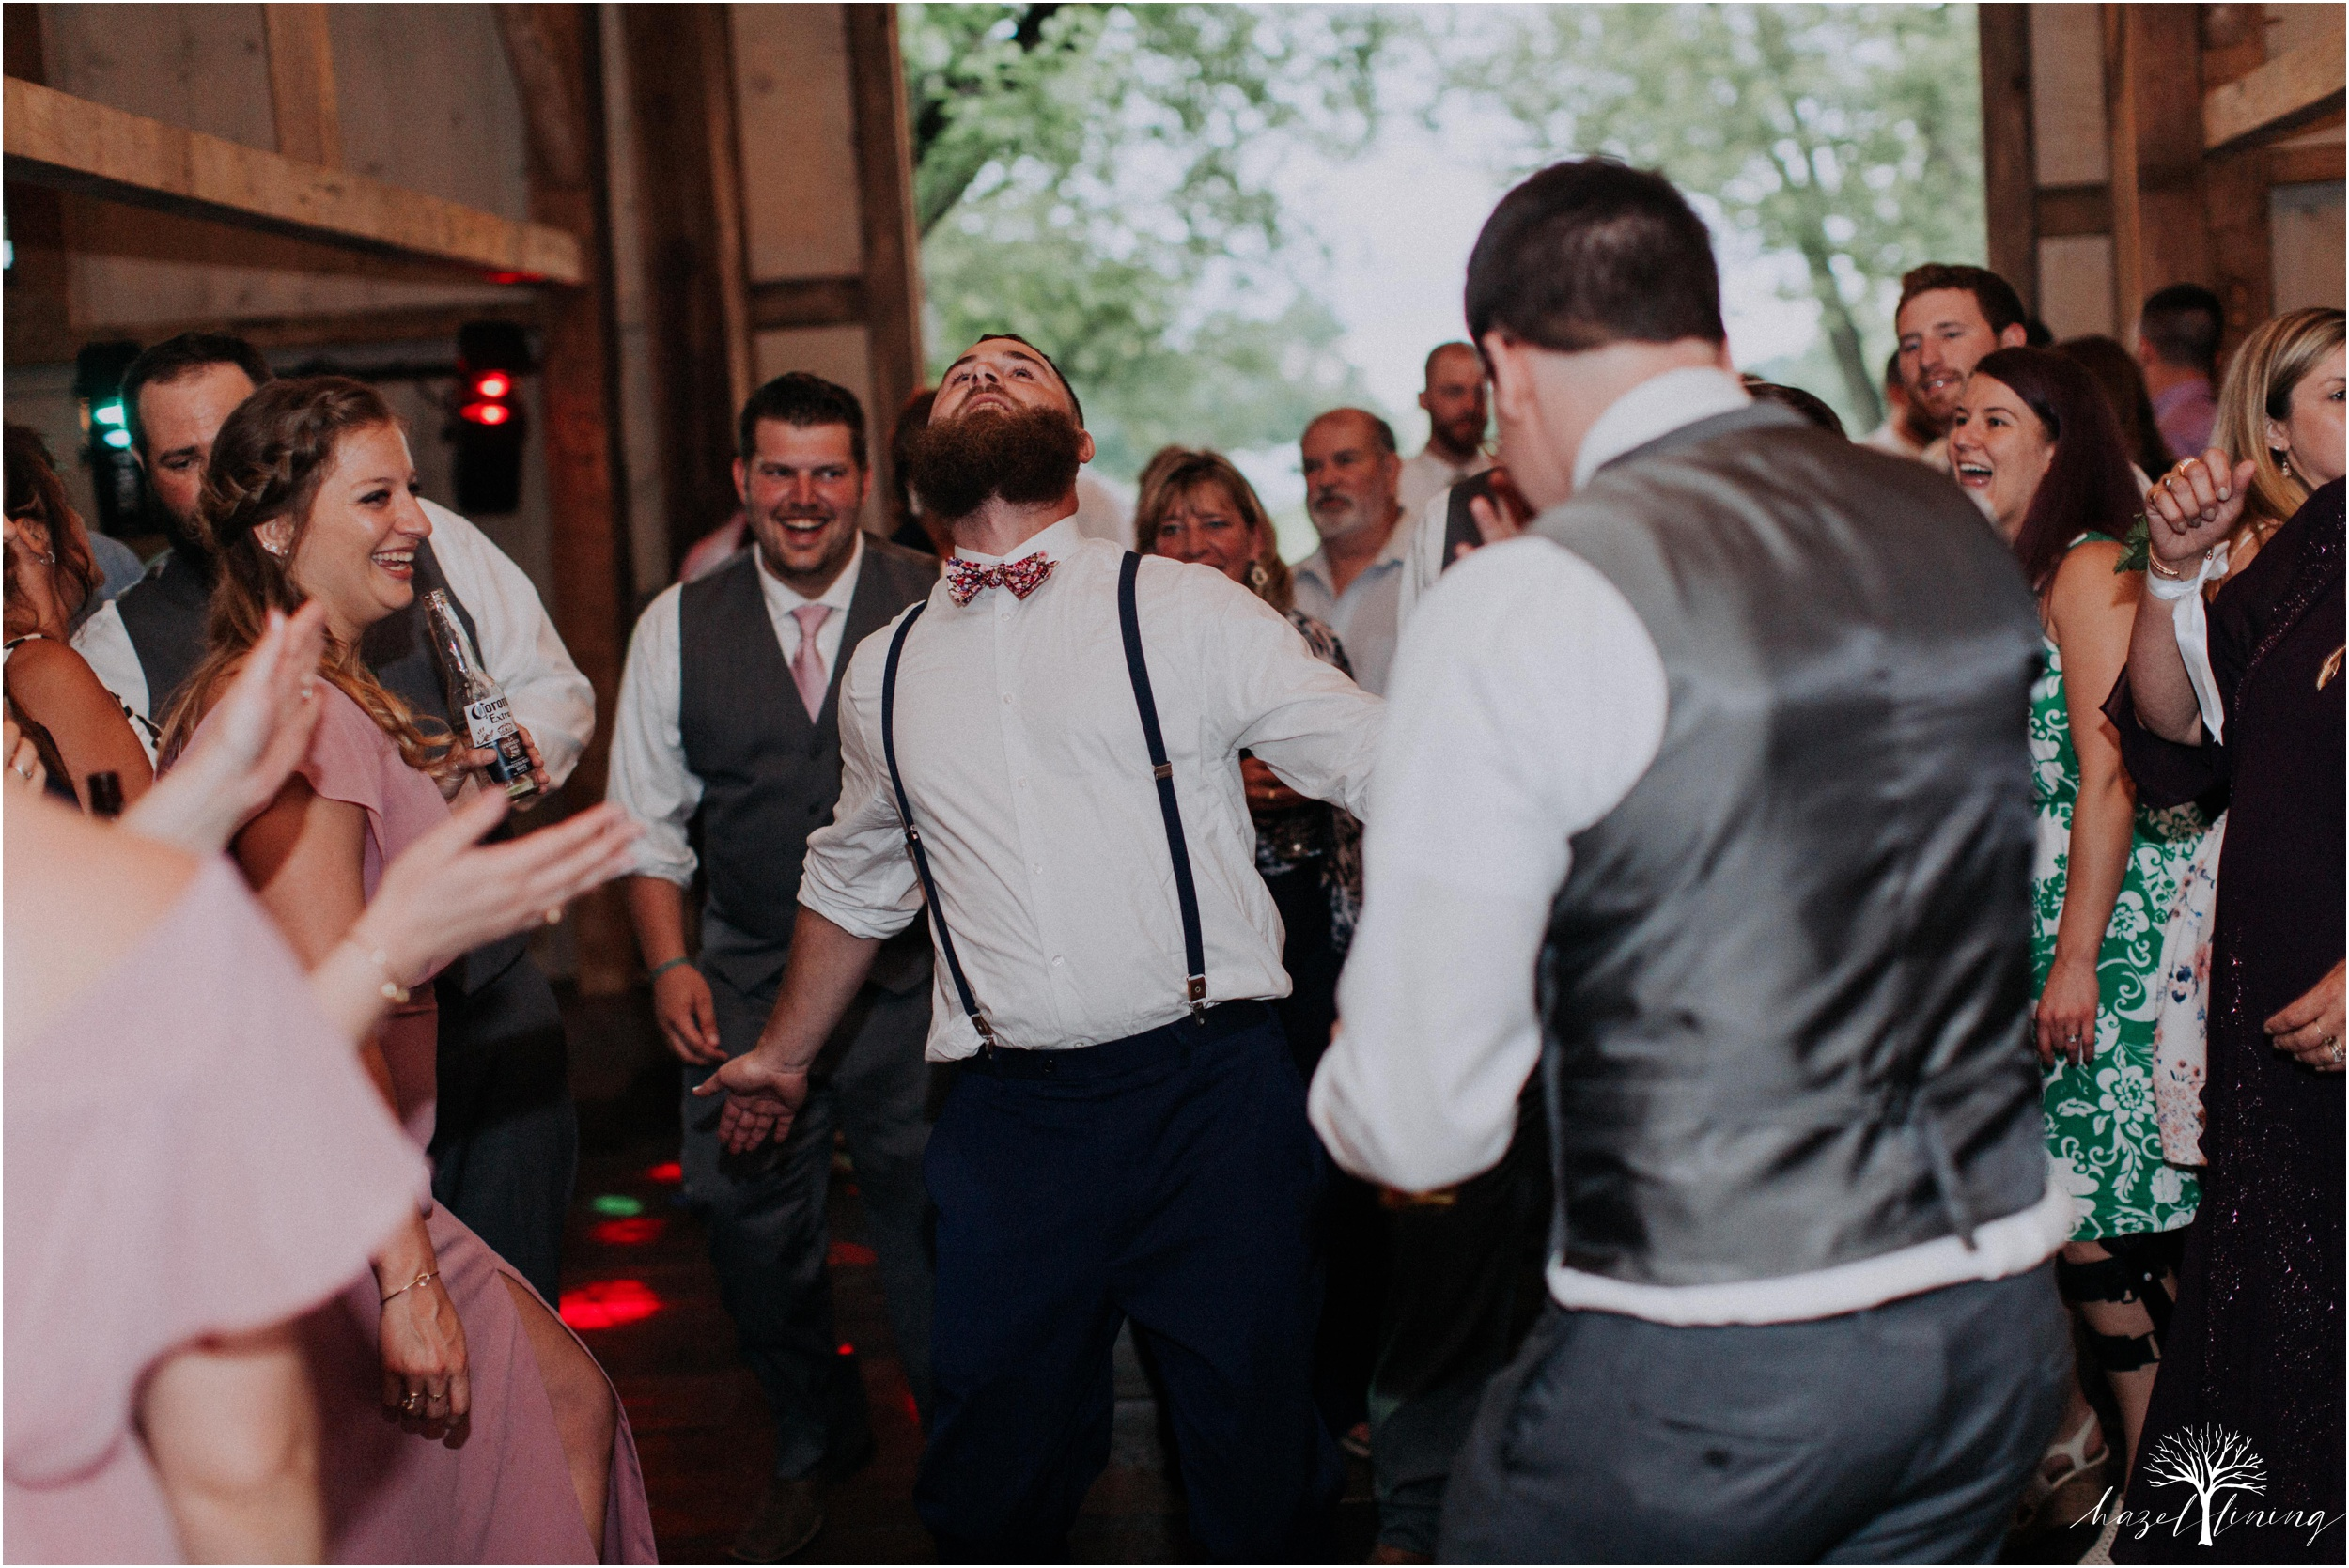 hazel-lining-travel-wedding-elopement-photography-lisa-landon-shoemaker-the-farm-bakery-and-events-bucks-county-quakertown-pennsylvania-summer-country-outdoor-farm-wedding_0153.jpg